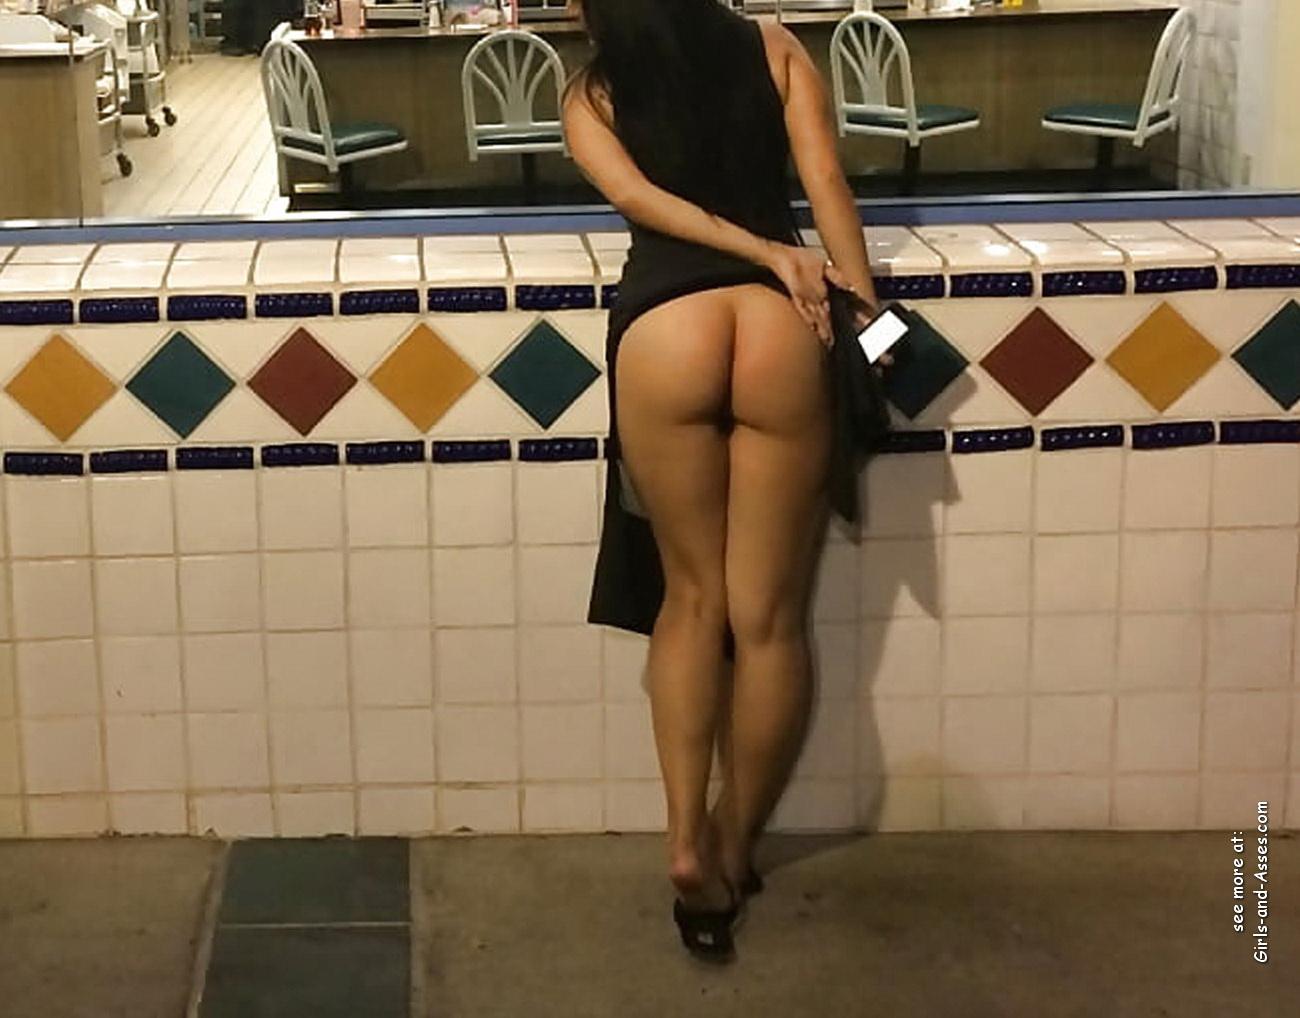 nude female backside in public photo 00834